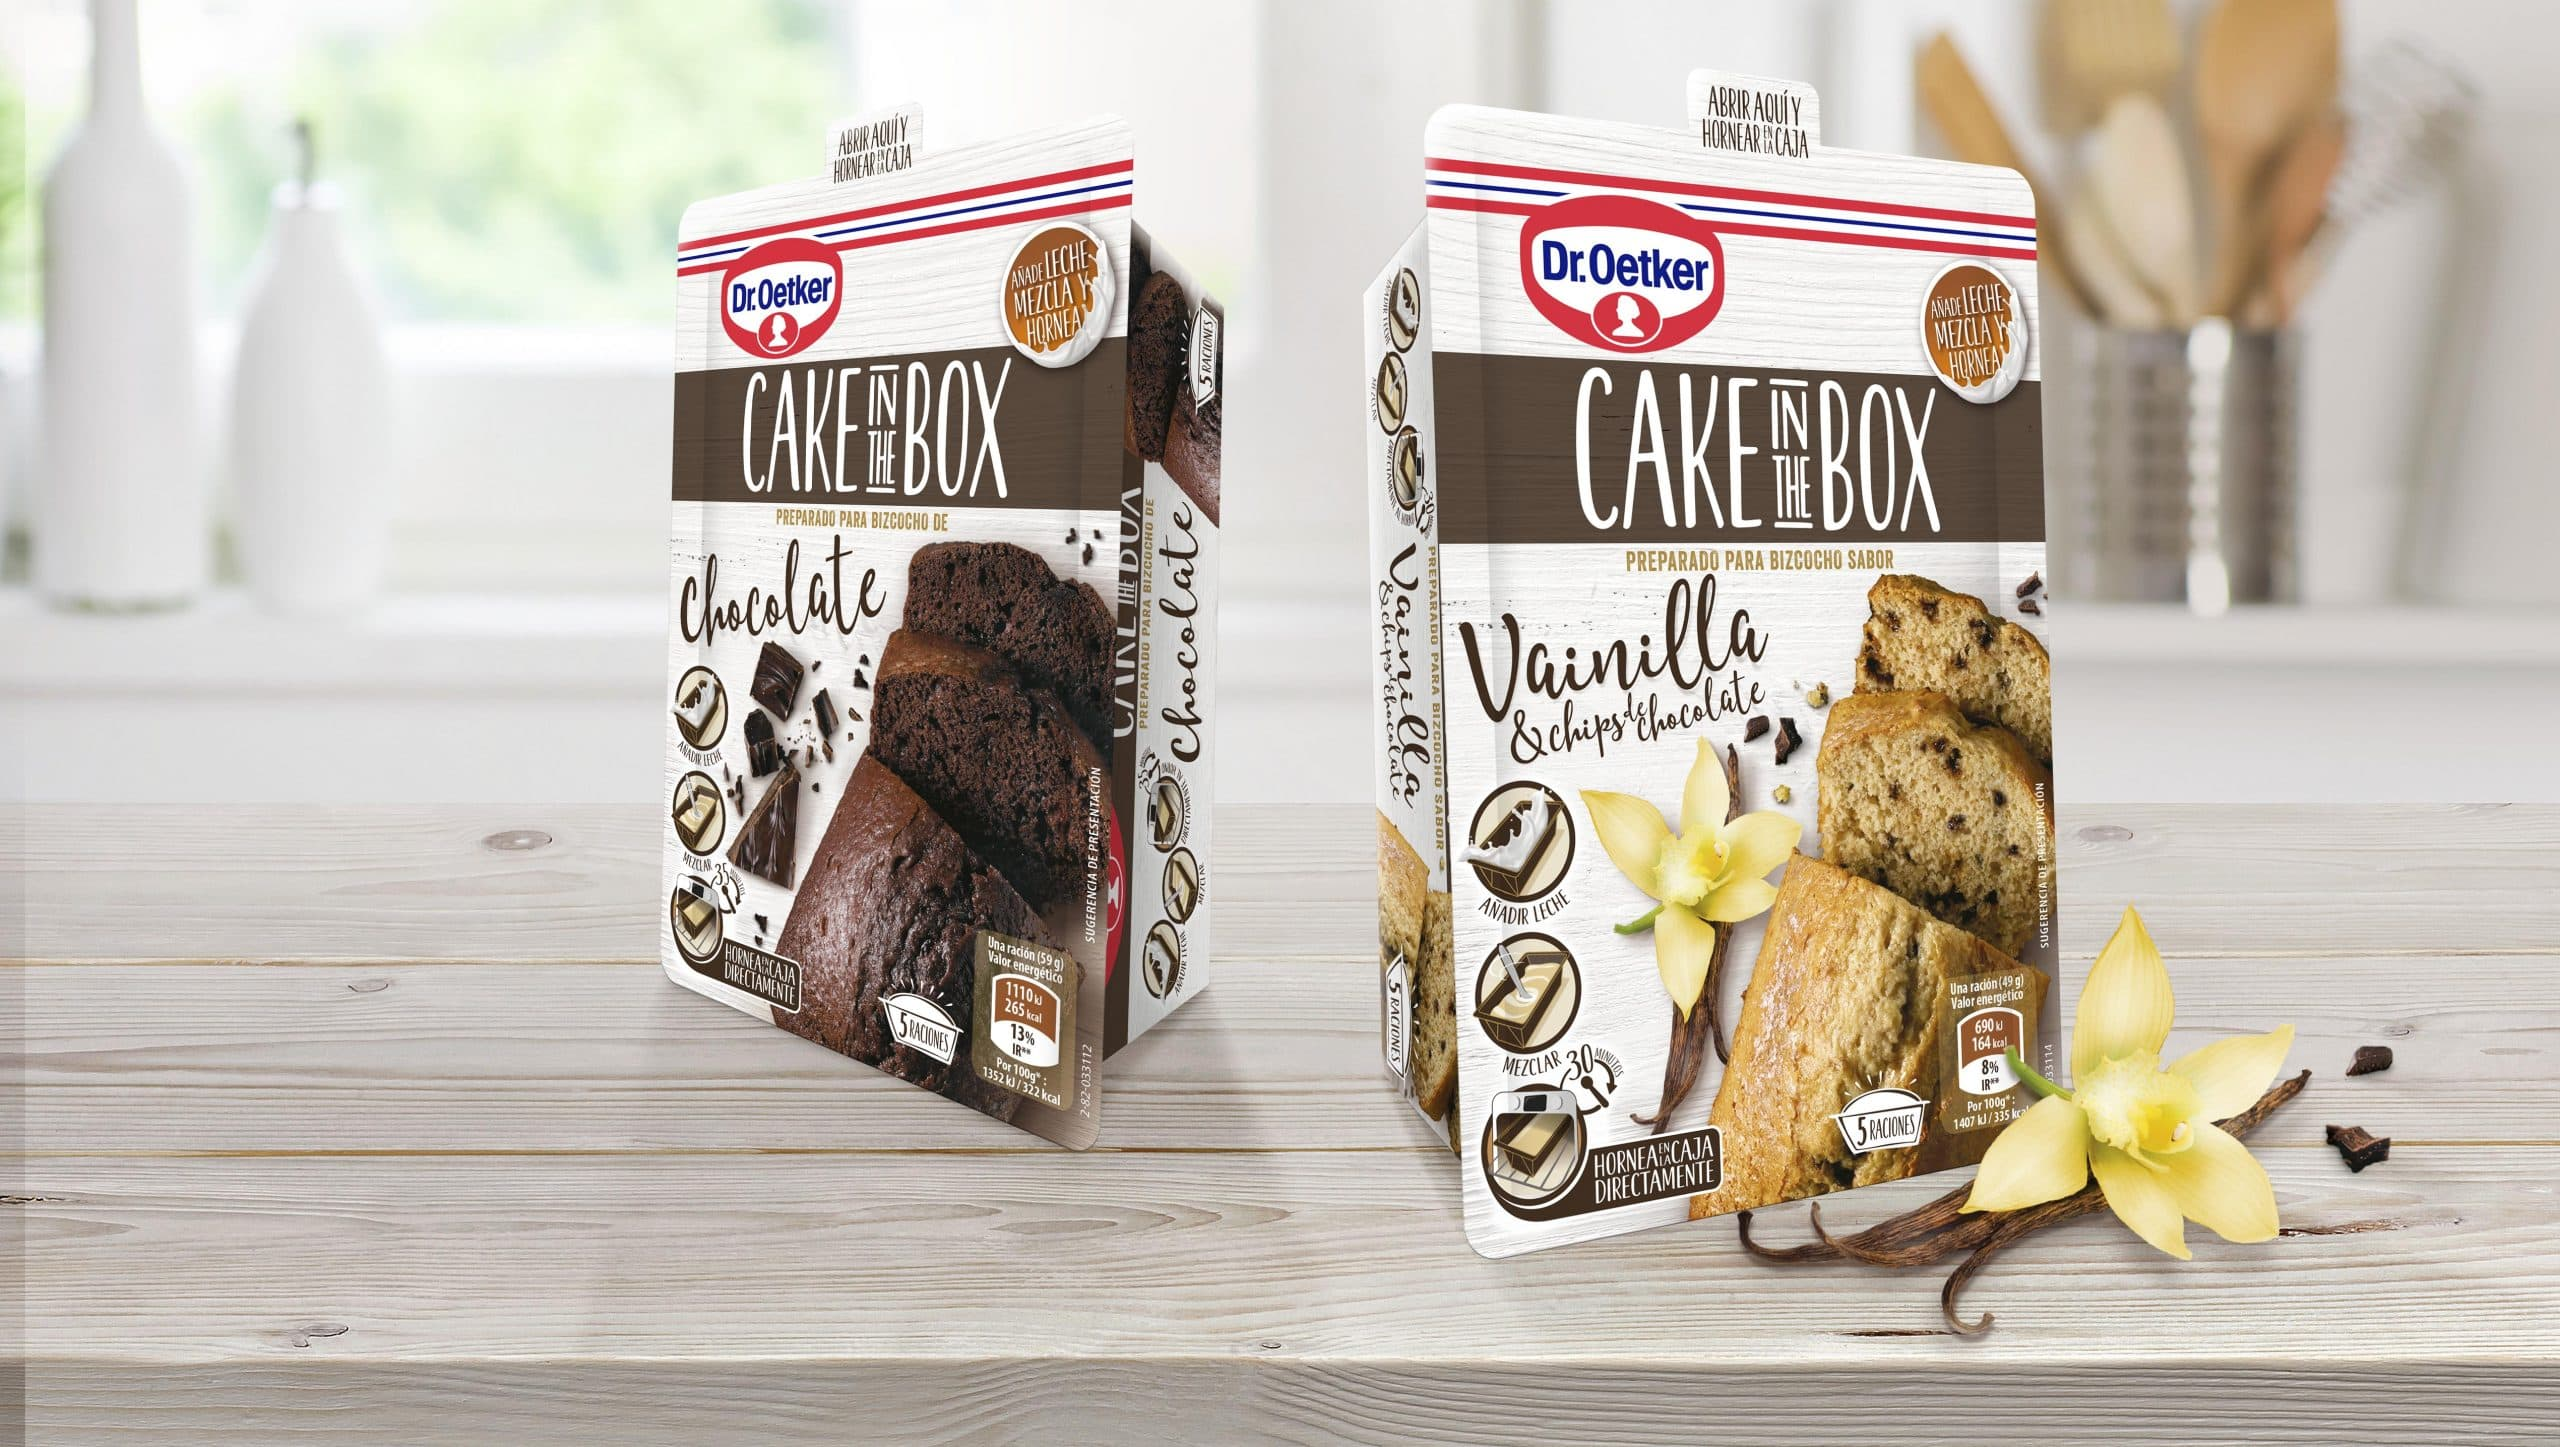 CAKE IN THE BOX